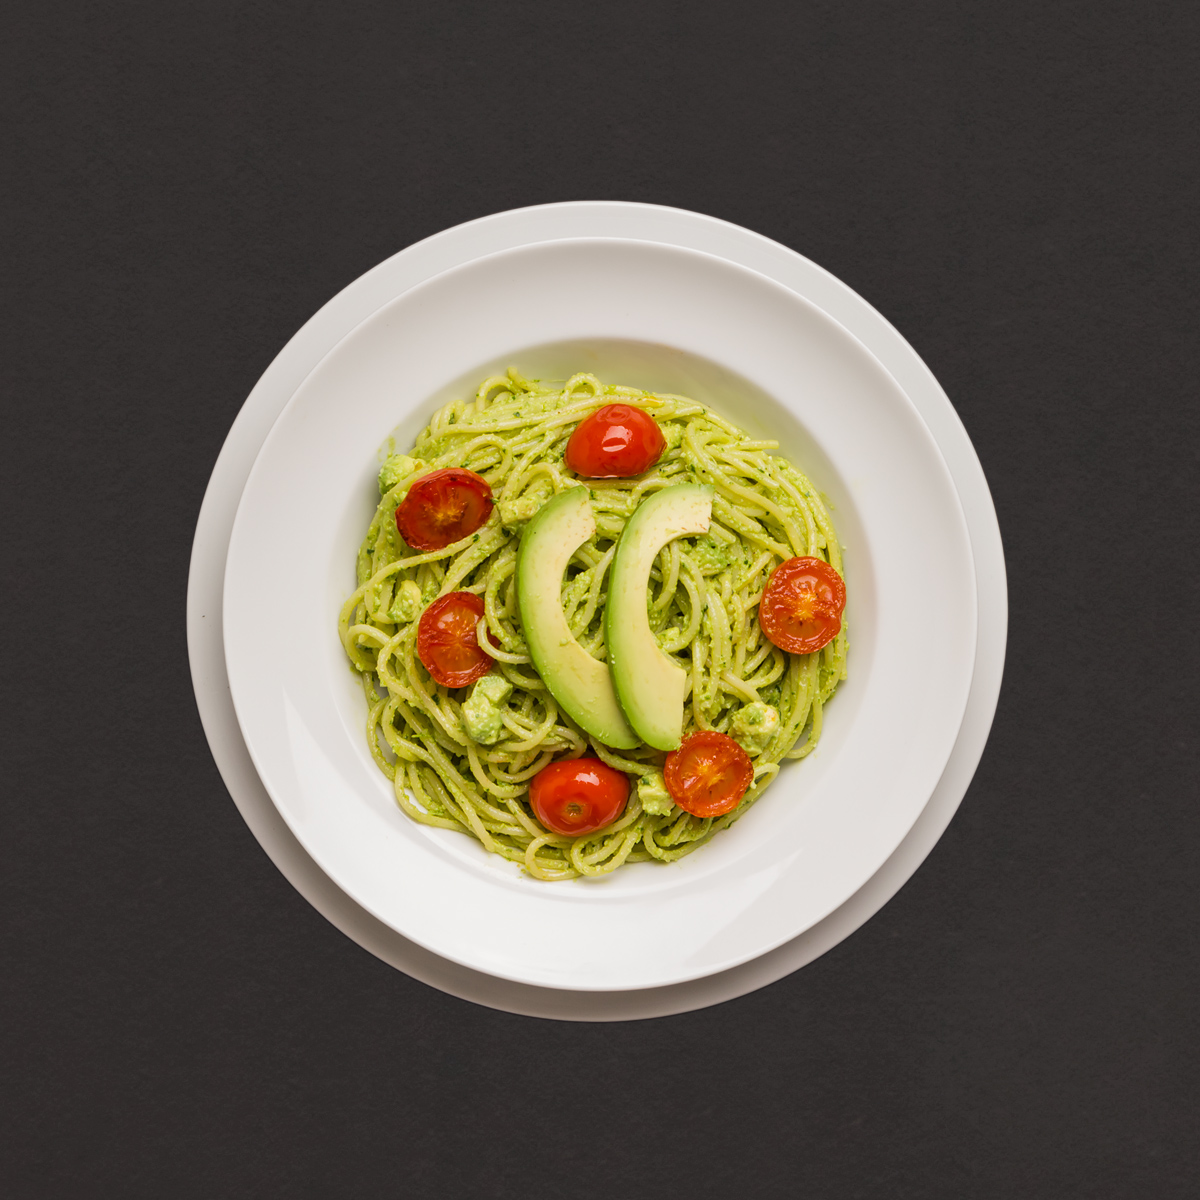 spaghetti mit cremigem avocado macadamiapesto und gebratenen tomaten rezept kochhaus. Black Bedroom Furniture Sets. Home Design Ideas